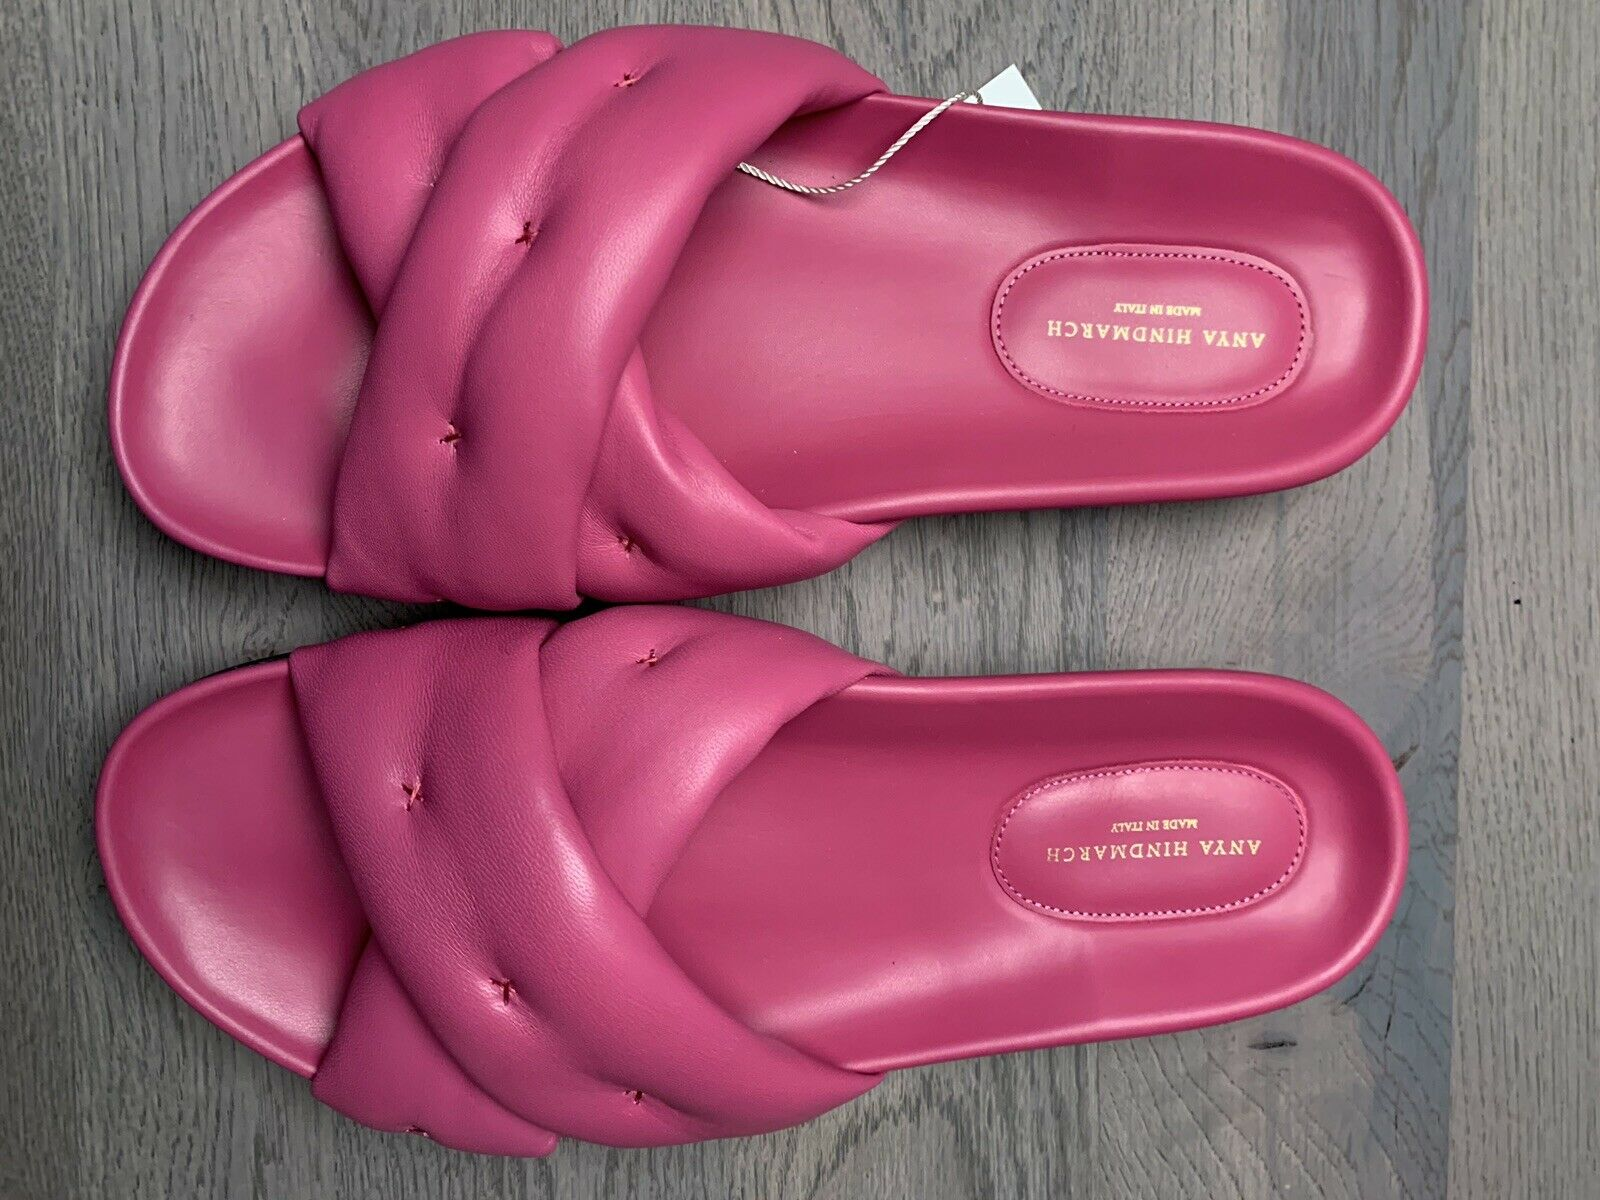 Anya hindmarch Cross -Over Slide Sandals Mules  Flats Scarpe 41  sport caldi